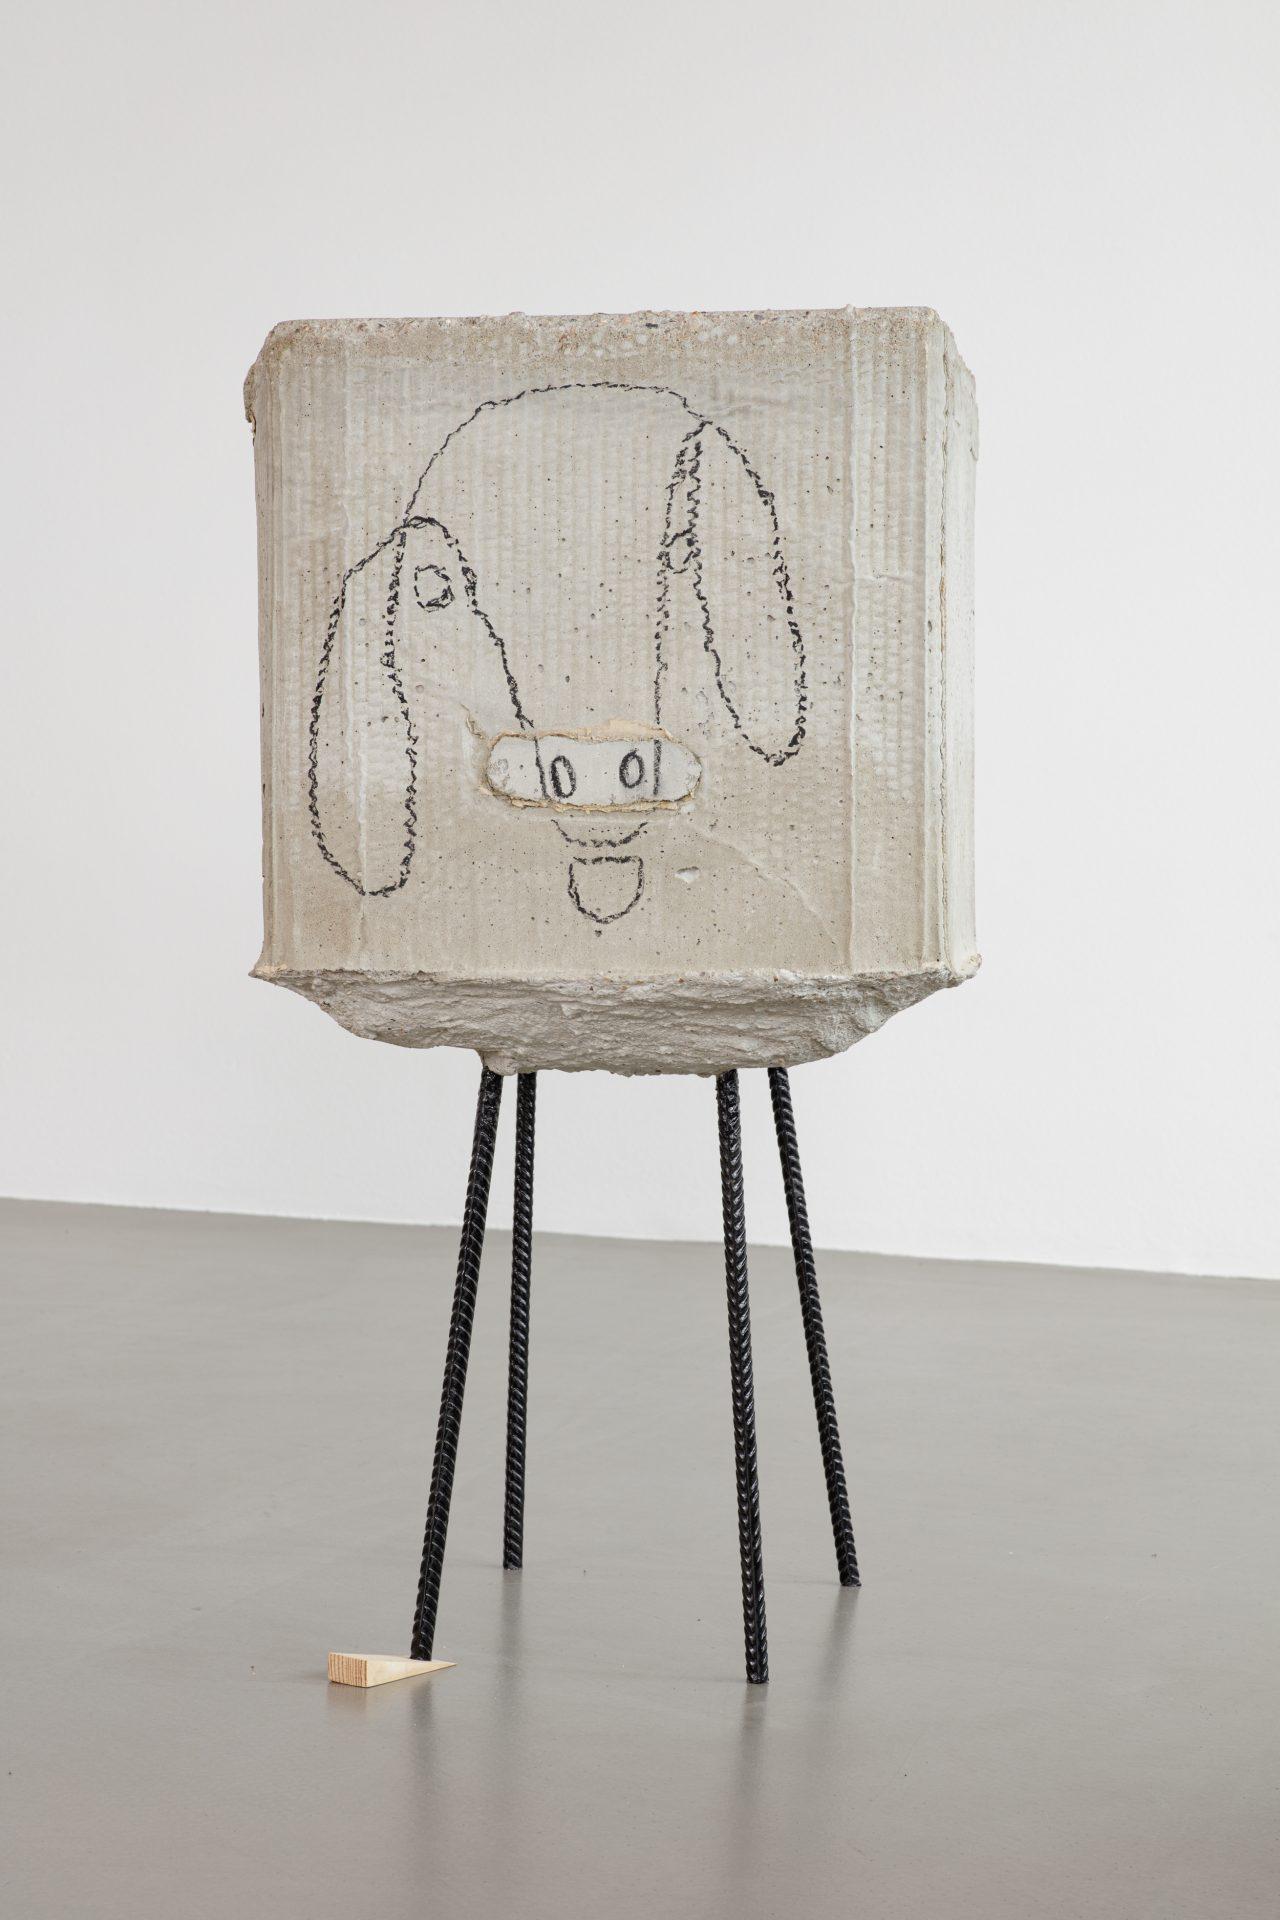 Judith Hopf, untitled (Schaf) (2013)